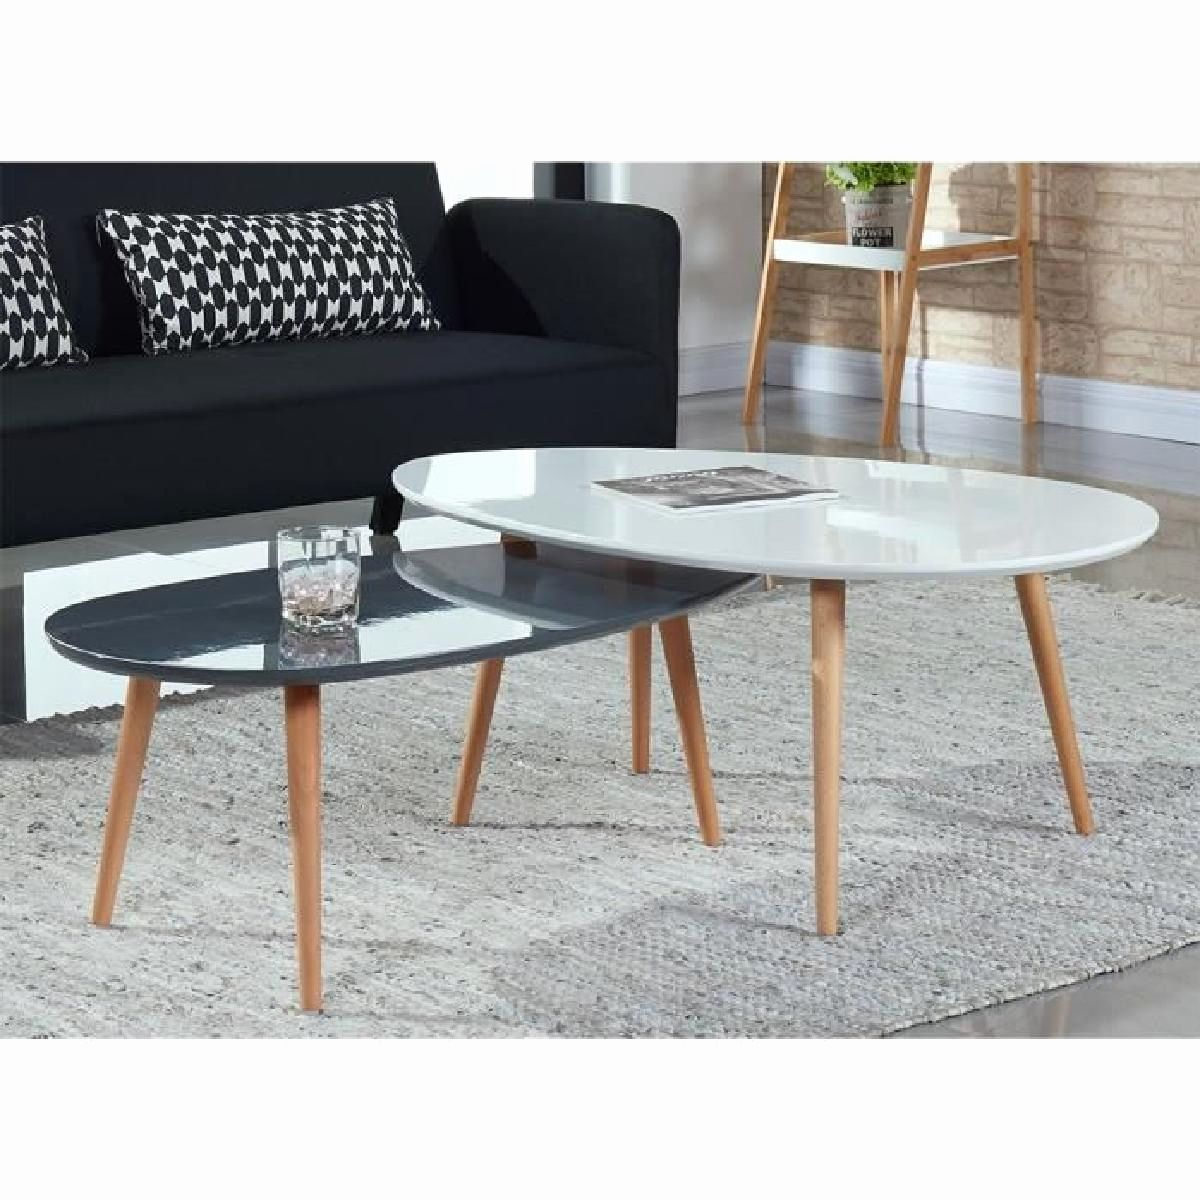 77 Table Salon Conforama Juillet 2018 Coffee Table Coffee Table